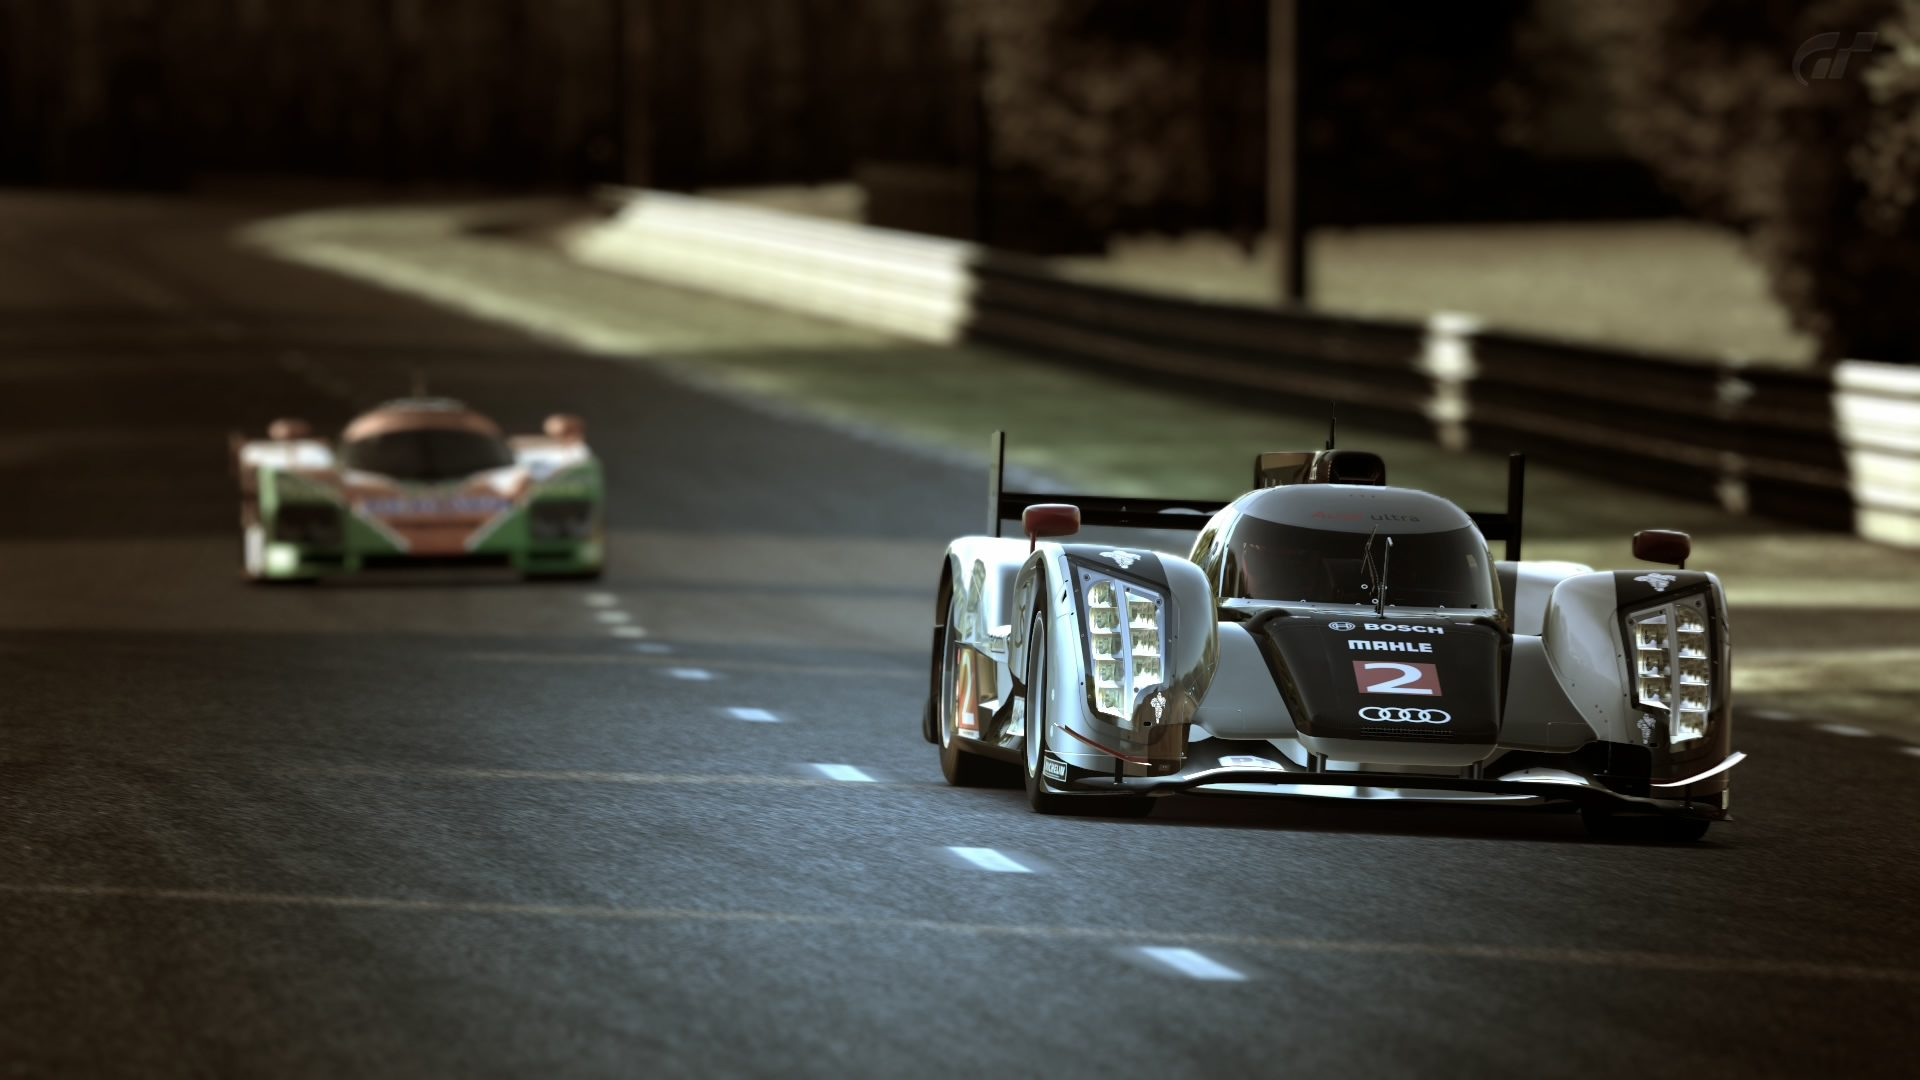 Circuit de la Sarthe 2013_7.jpg